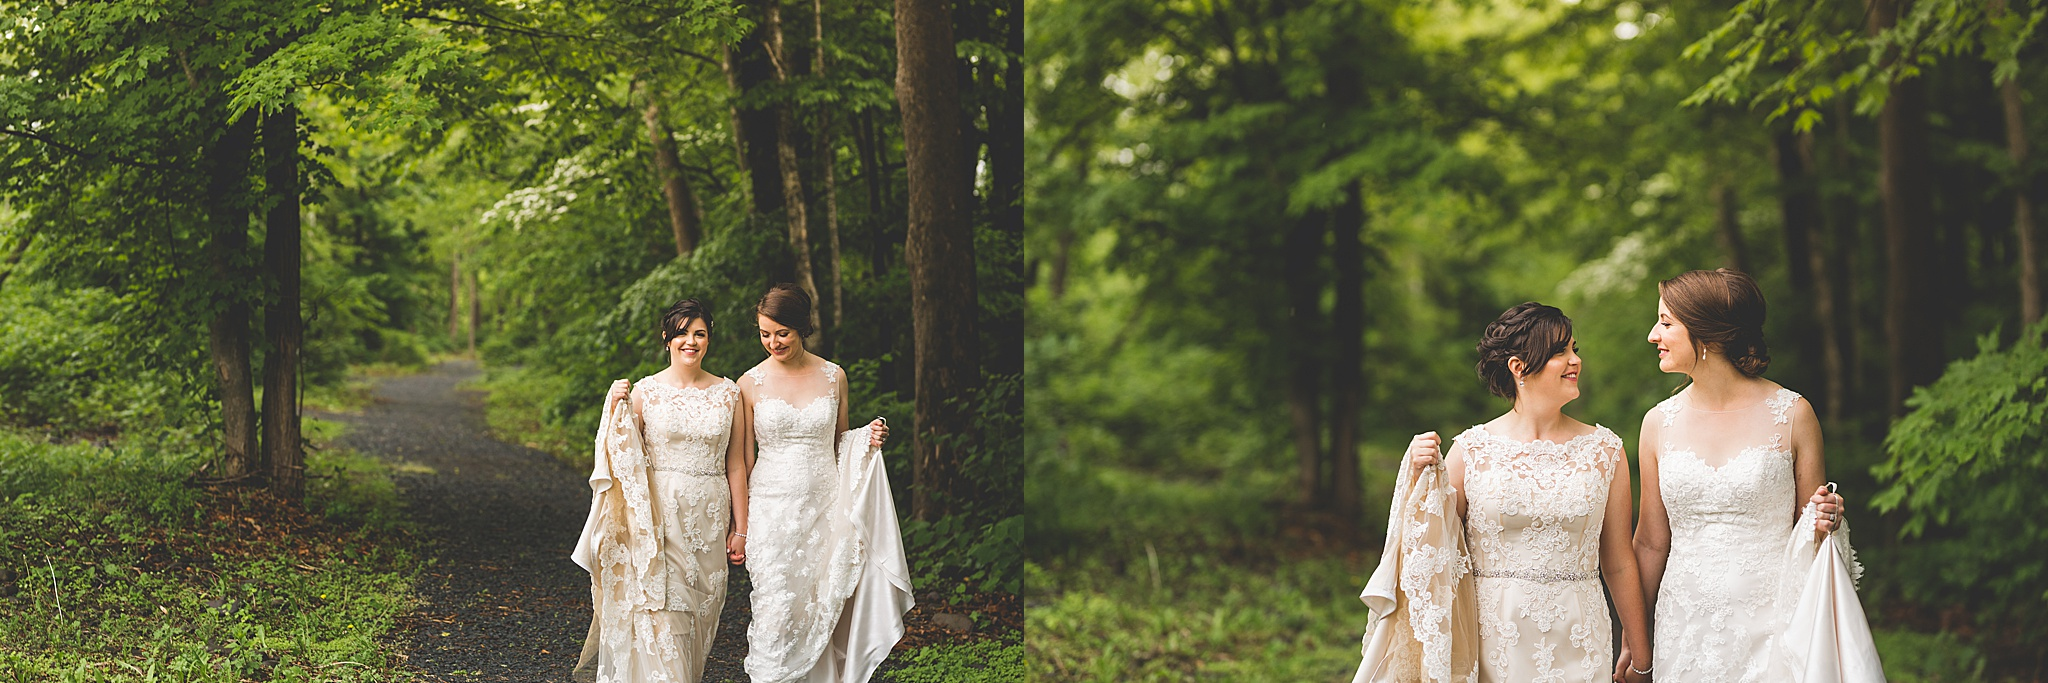 Albany_Wedding_Photographer_7359.jpg